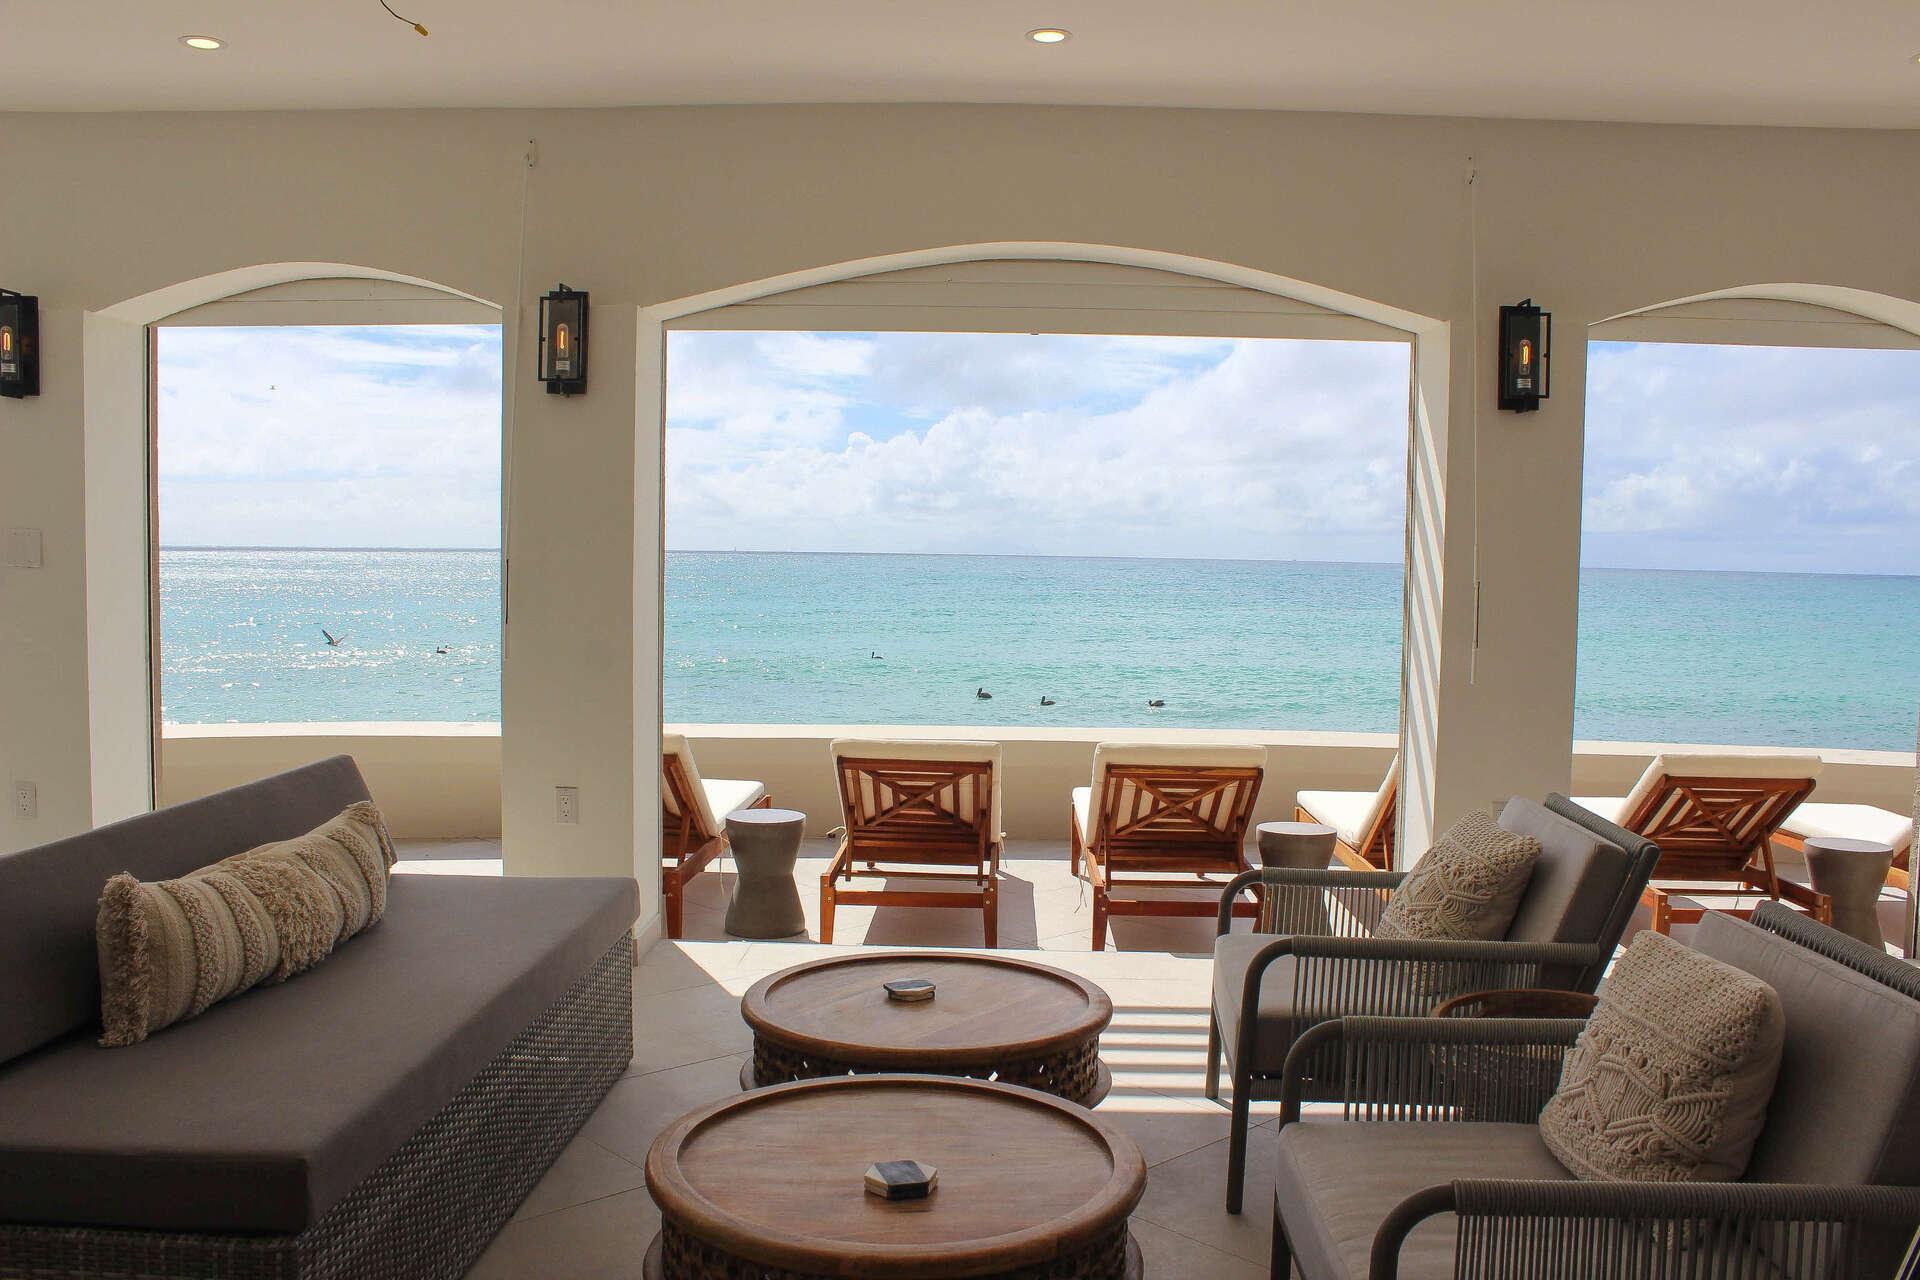 Luxury villa rentals caribbean - St martin - Sint maarten - Beacon hill - Faja Lobie - Image 1/39